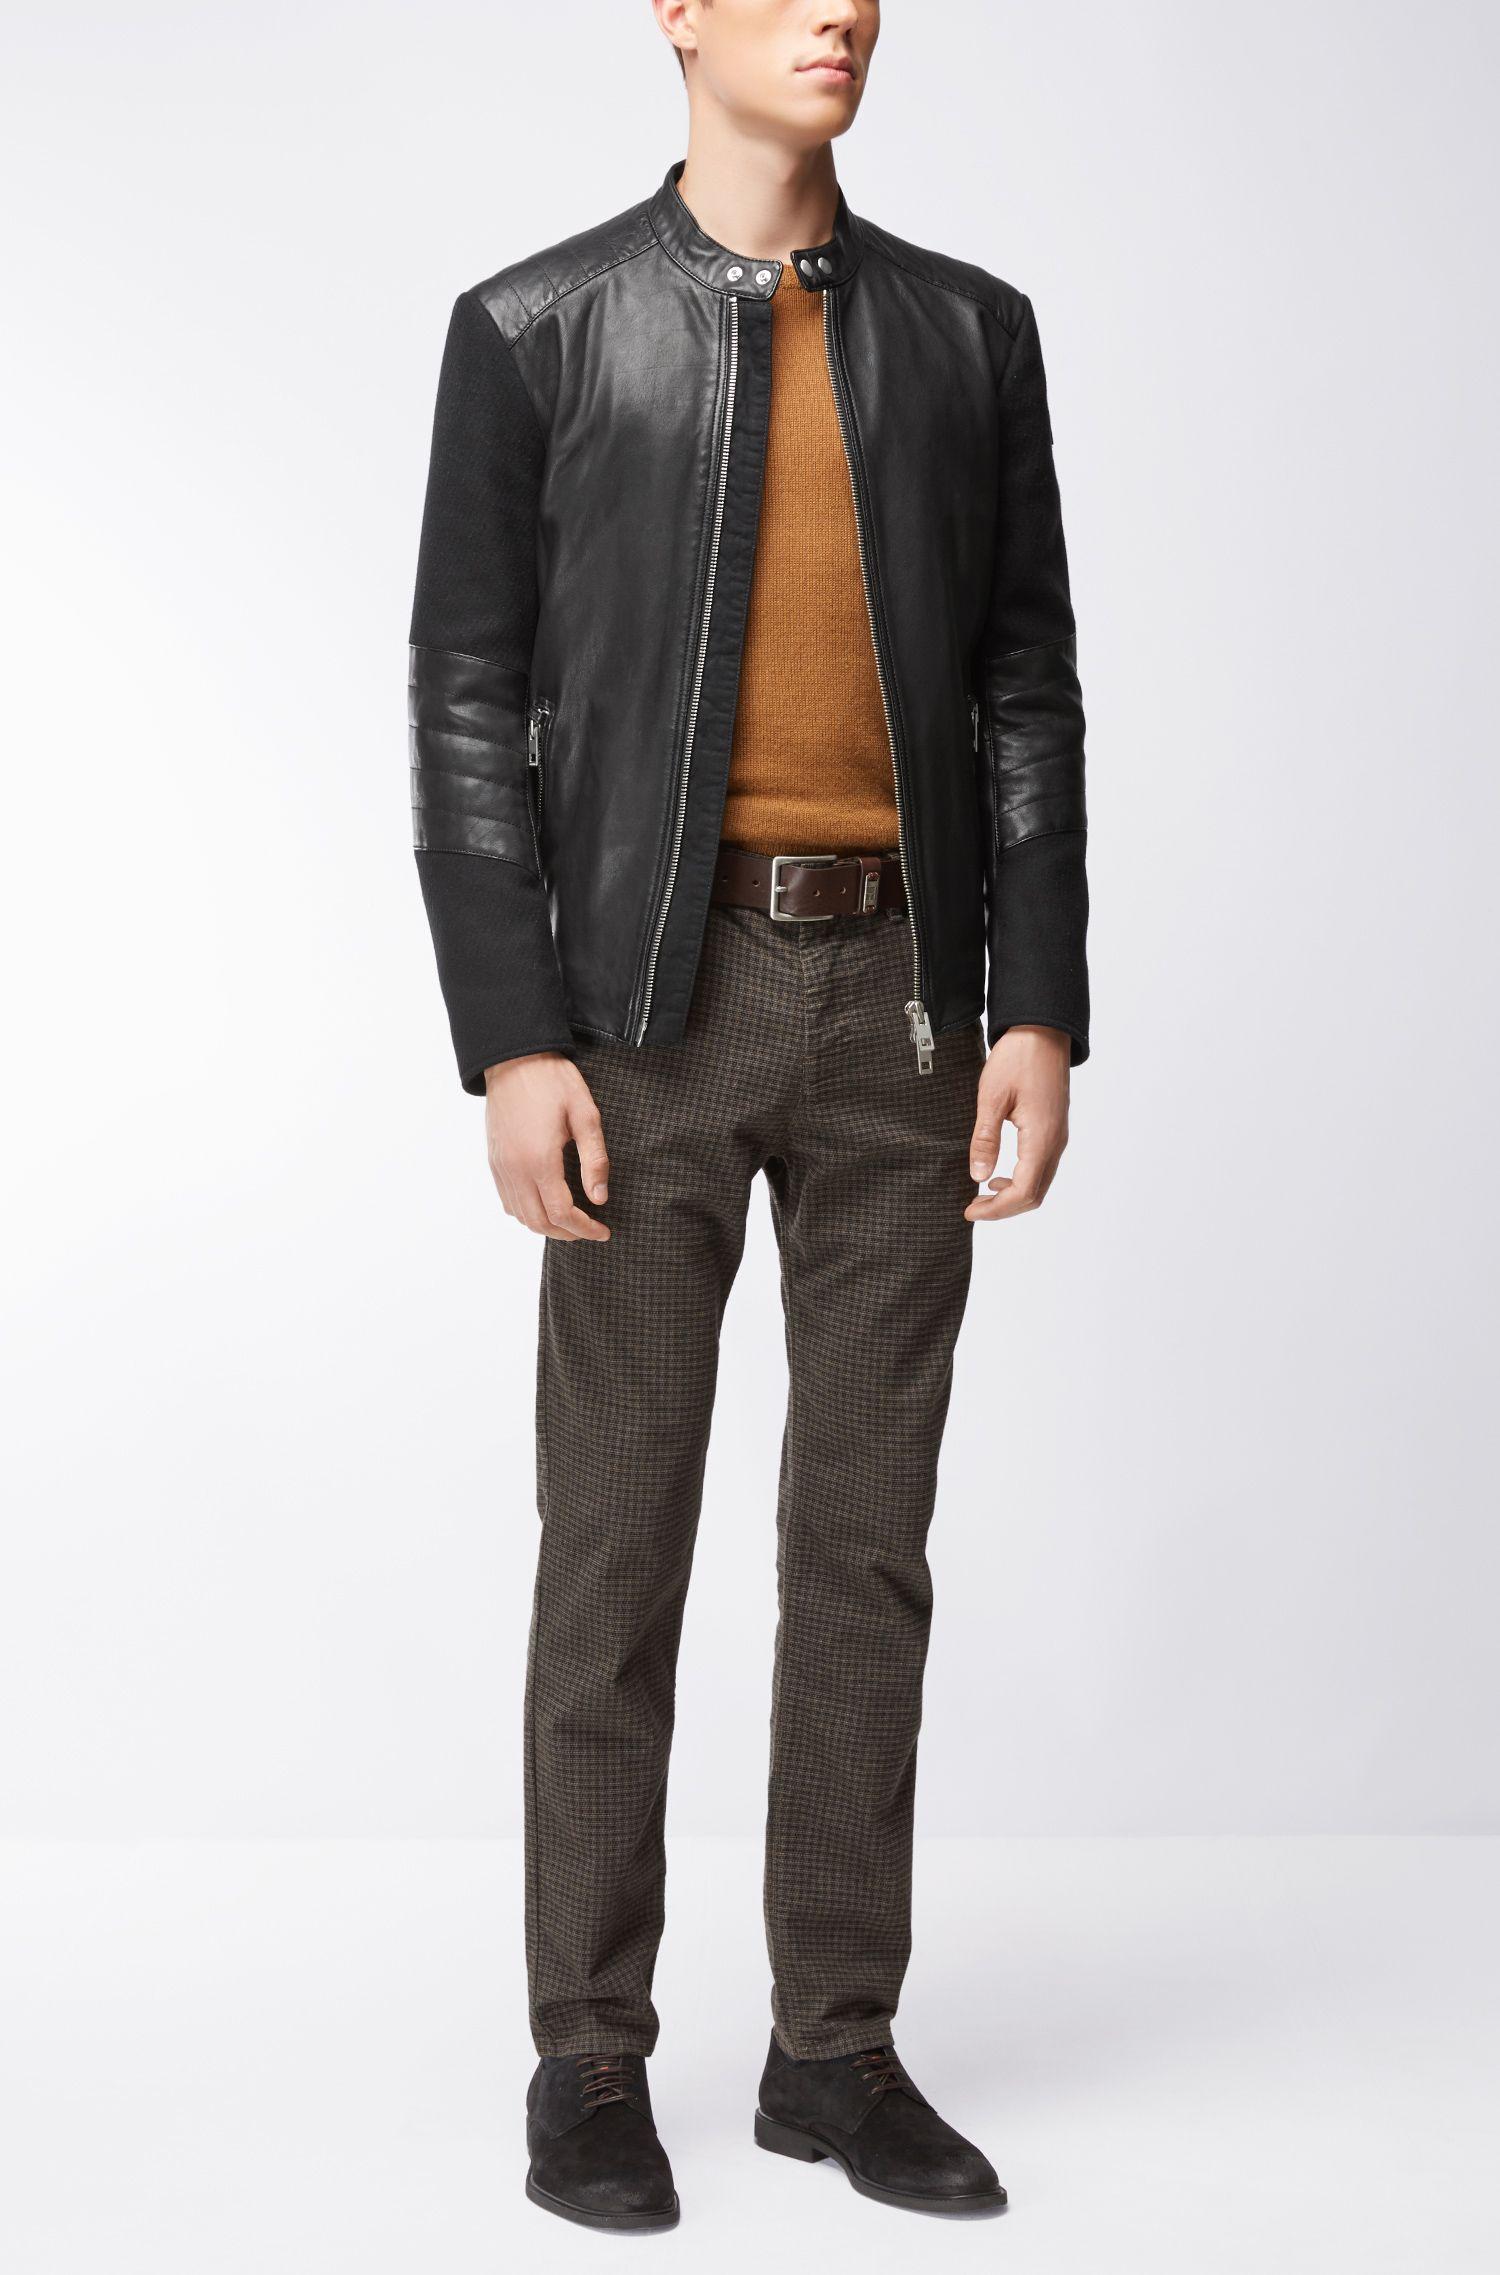 Sheepskin Jacket | Jeepy